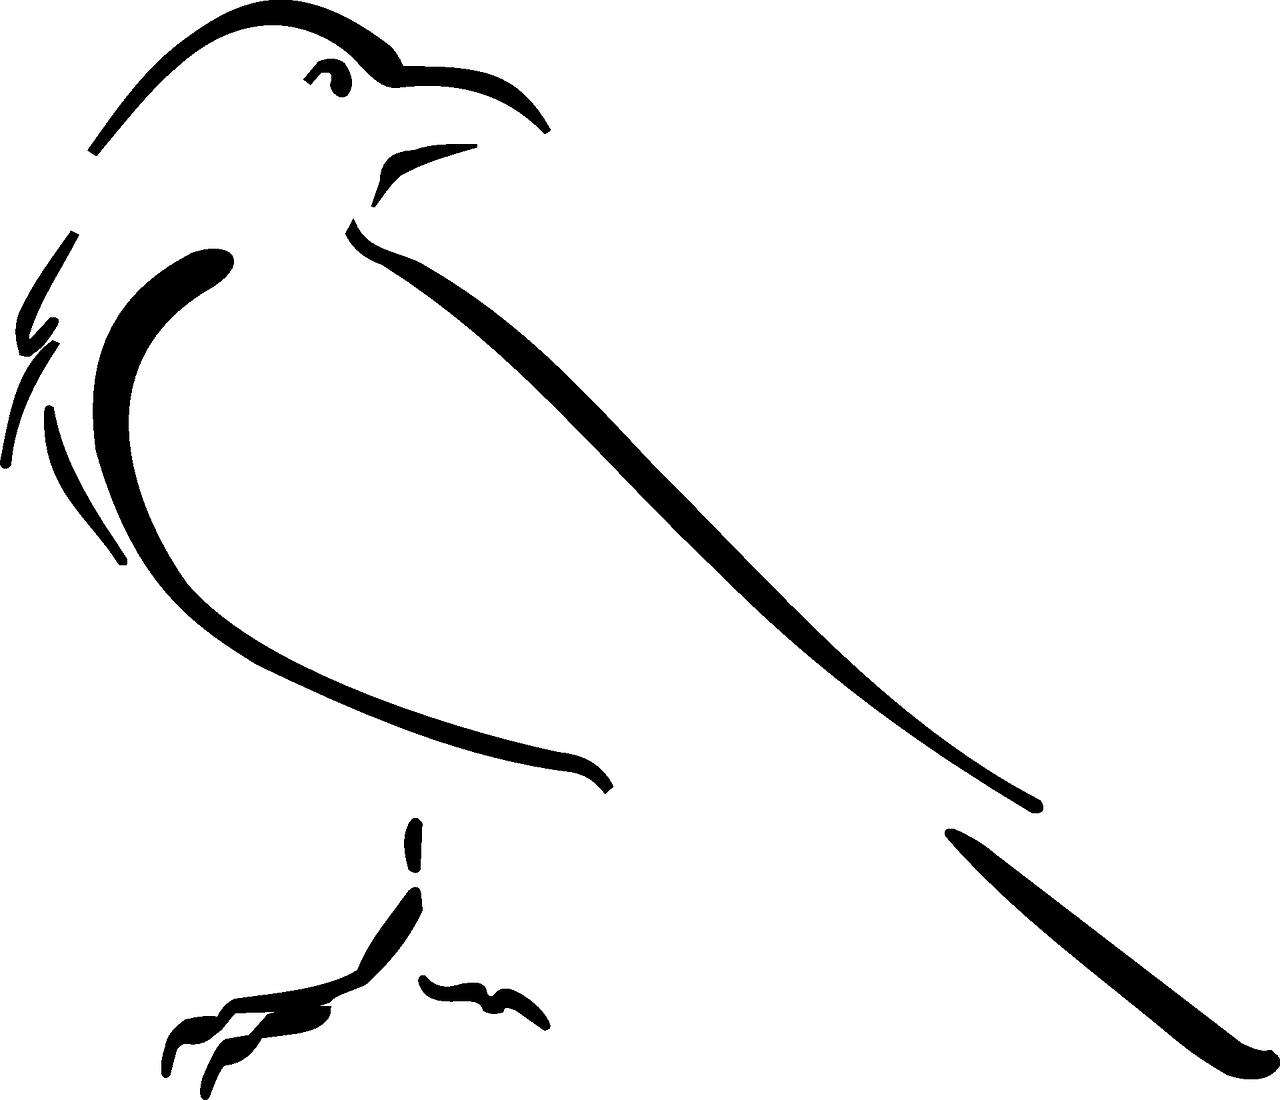 svg black and white stock Free image on pixabay. Blackbird drawing forearm